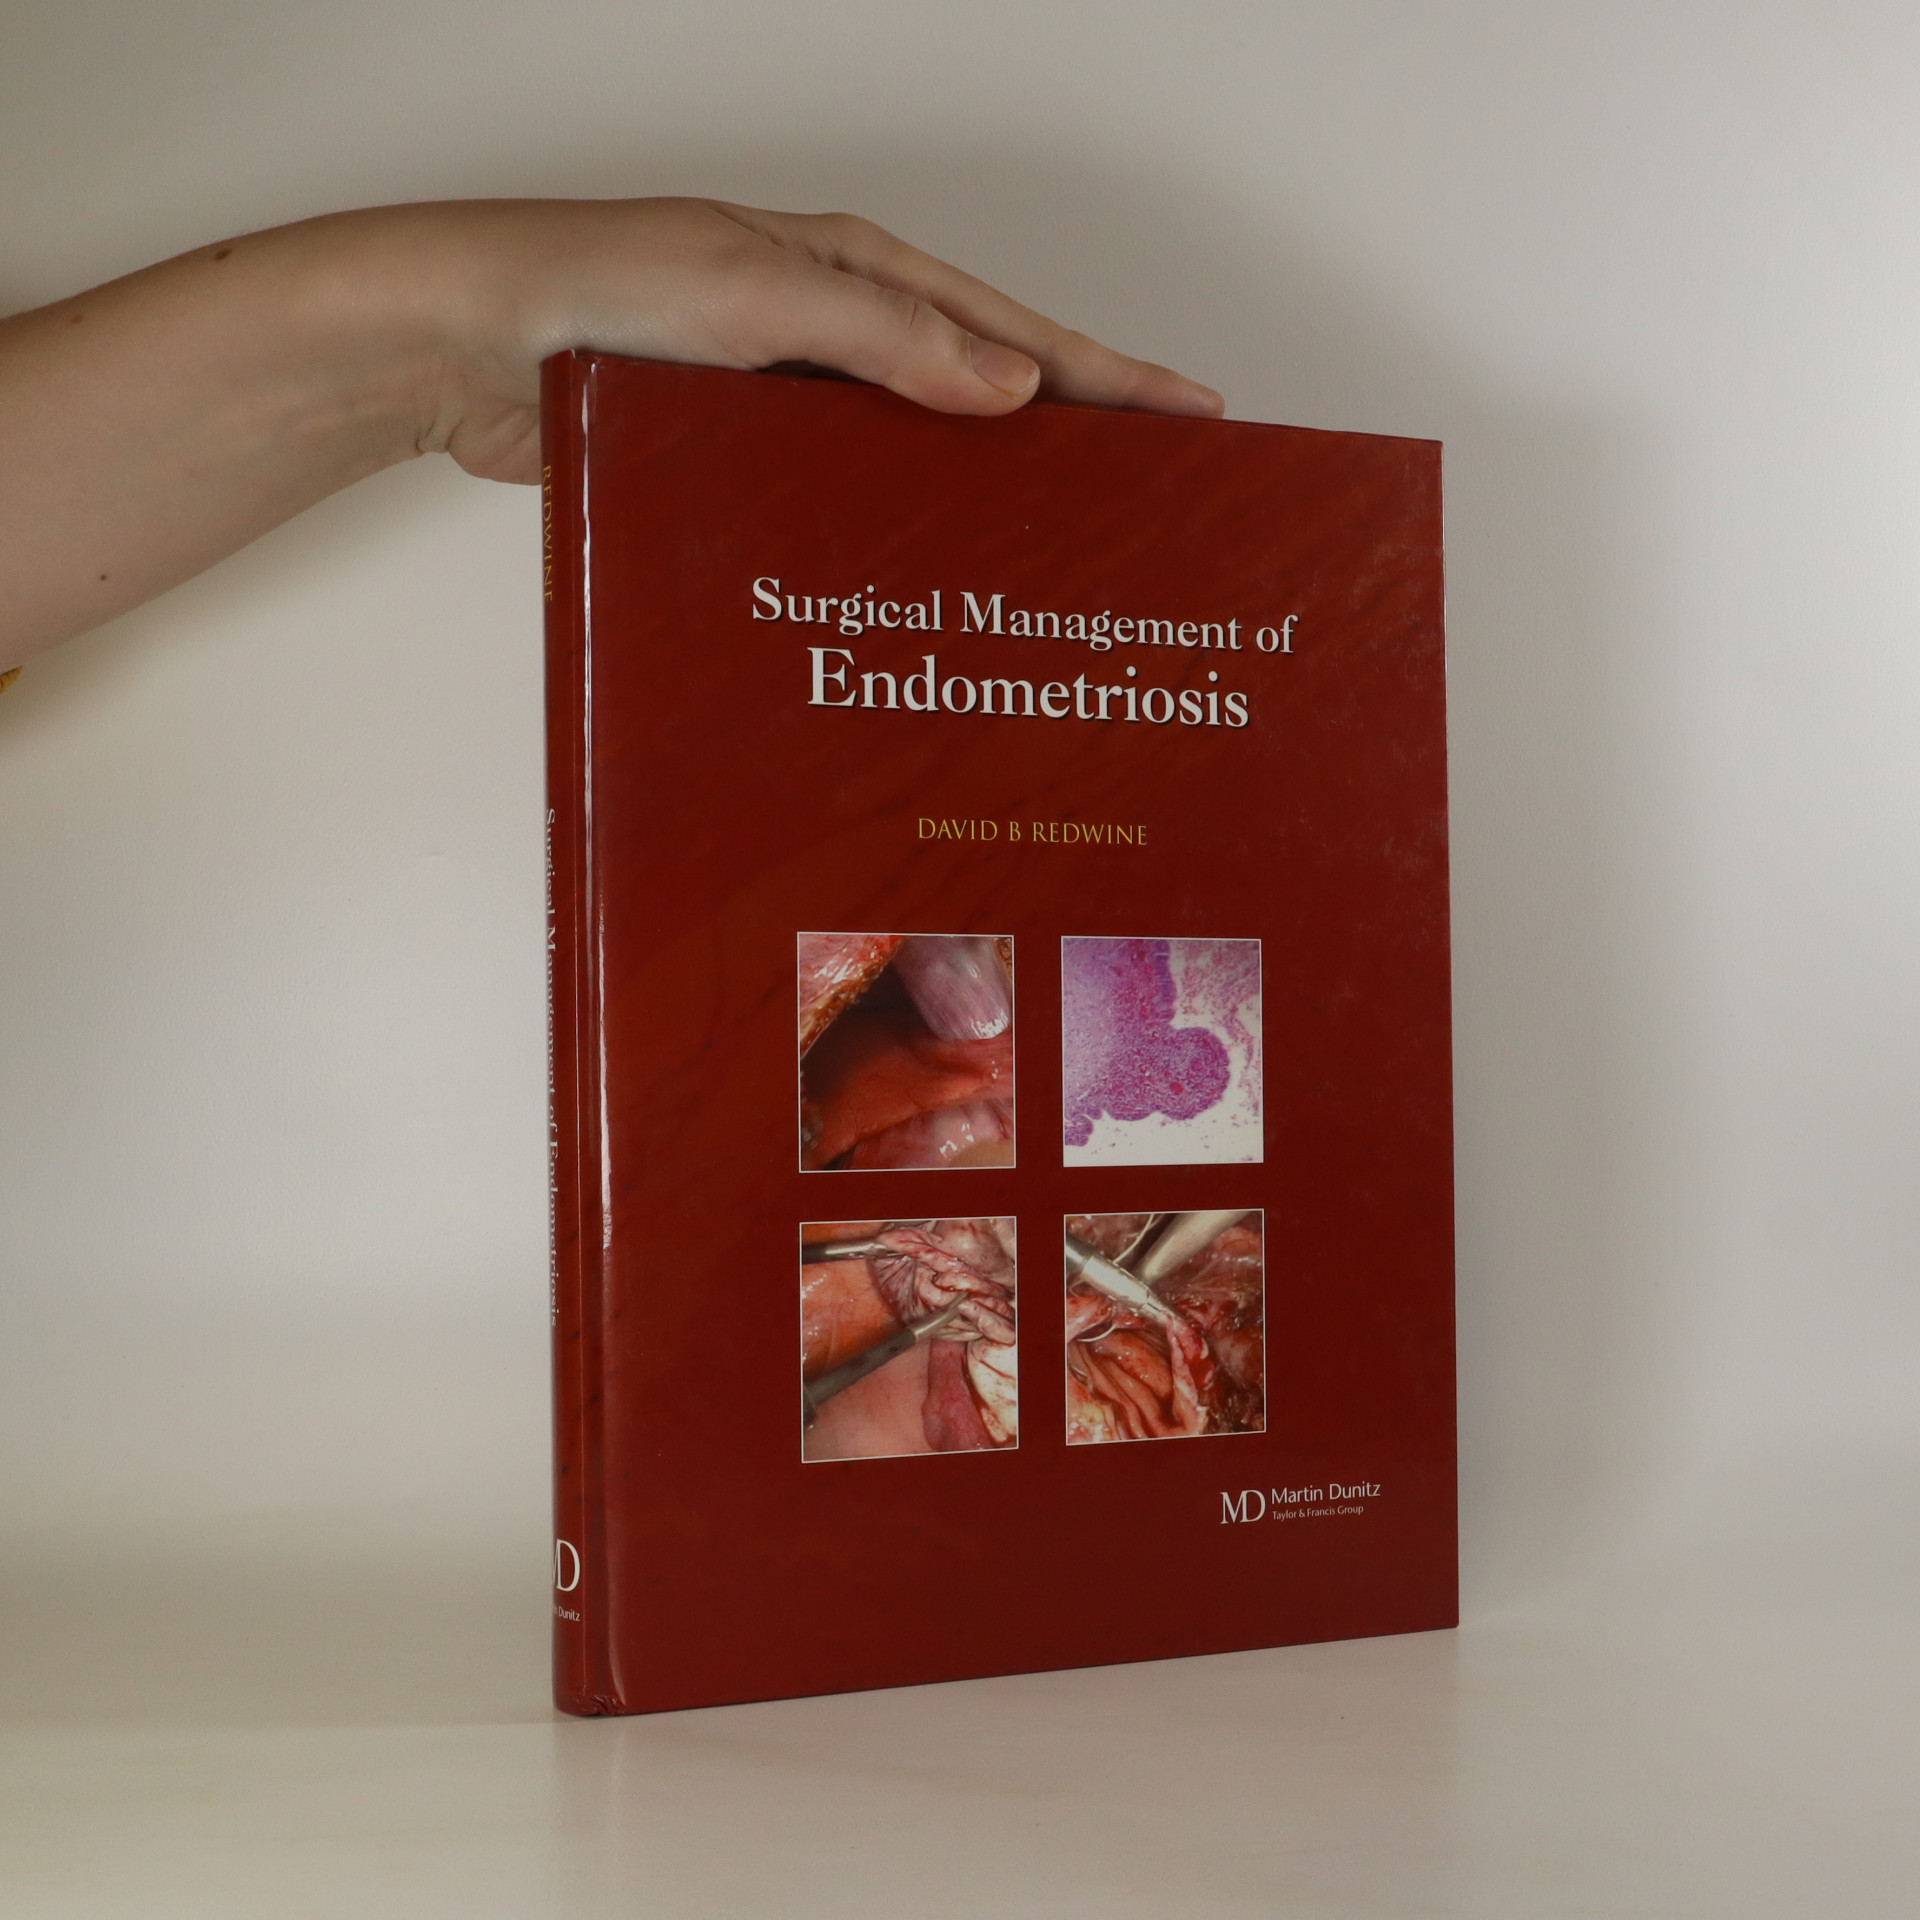 antikvární kniha Surgical Management of Endometriosis, neuveden